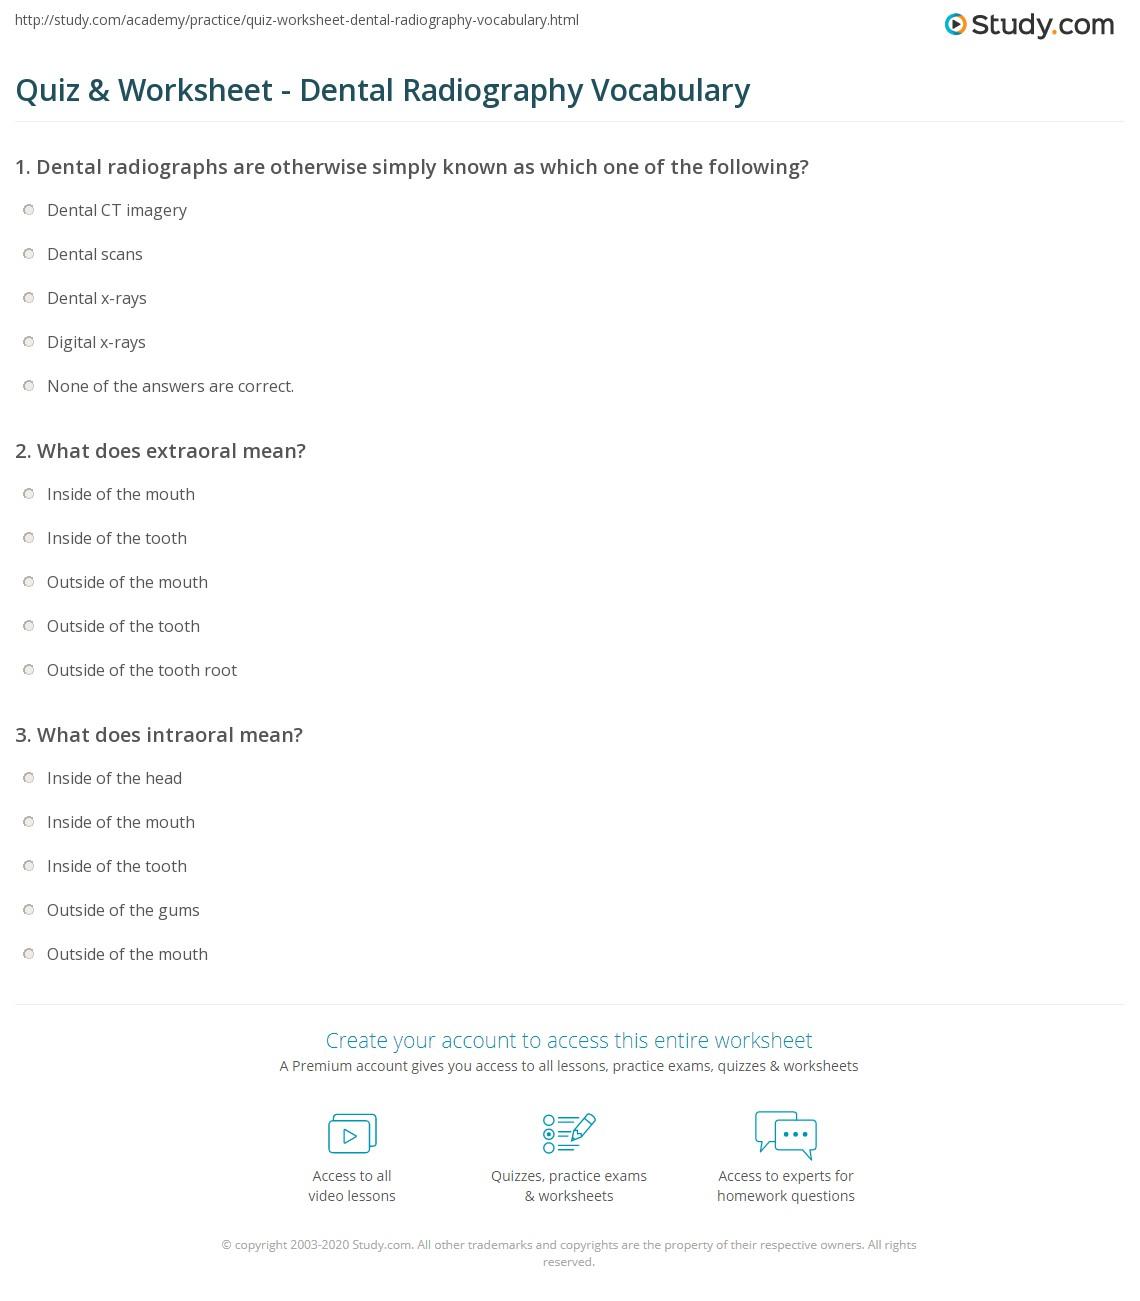 Quiz & Worksheet - Dental Radiography Vocabulary | Study.com